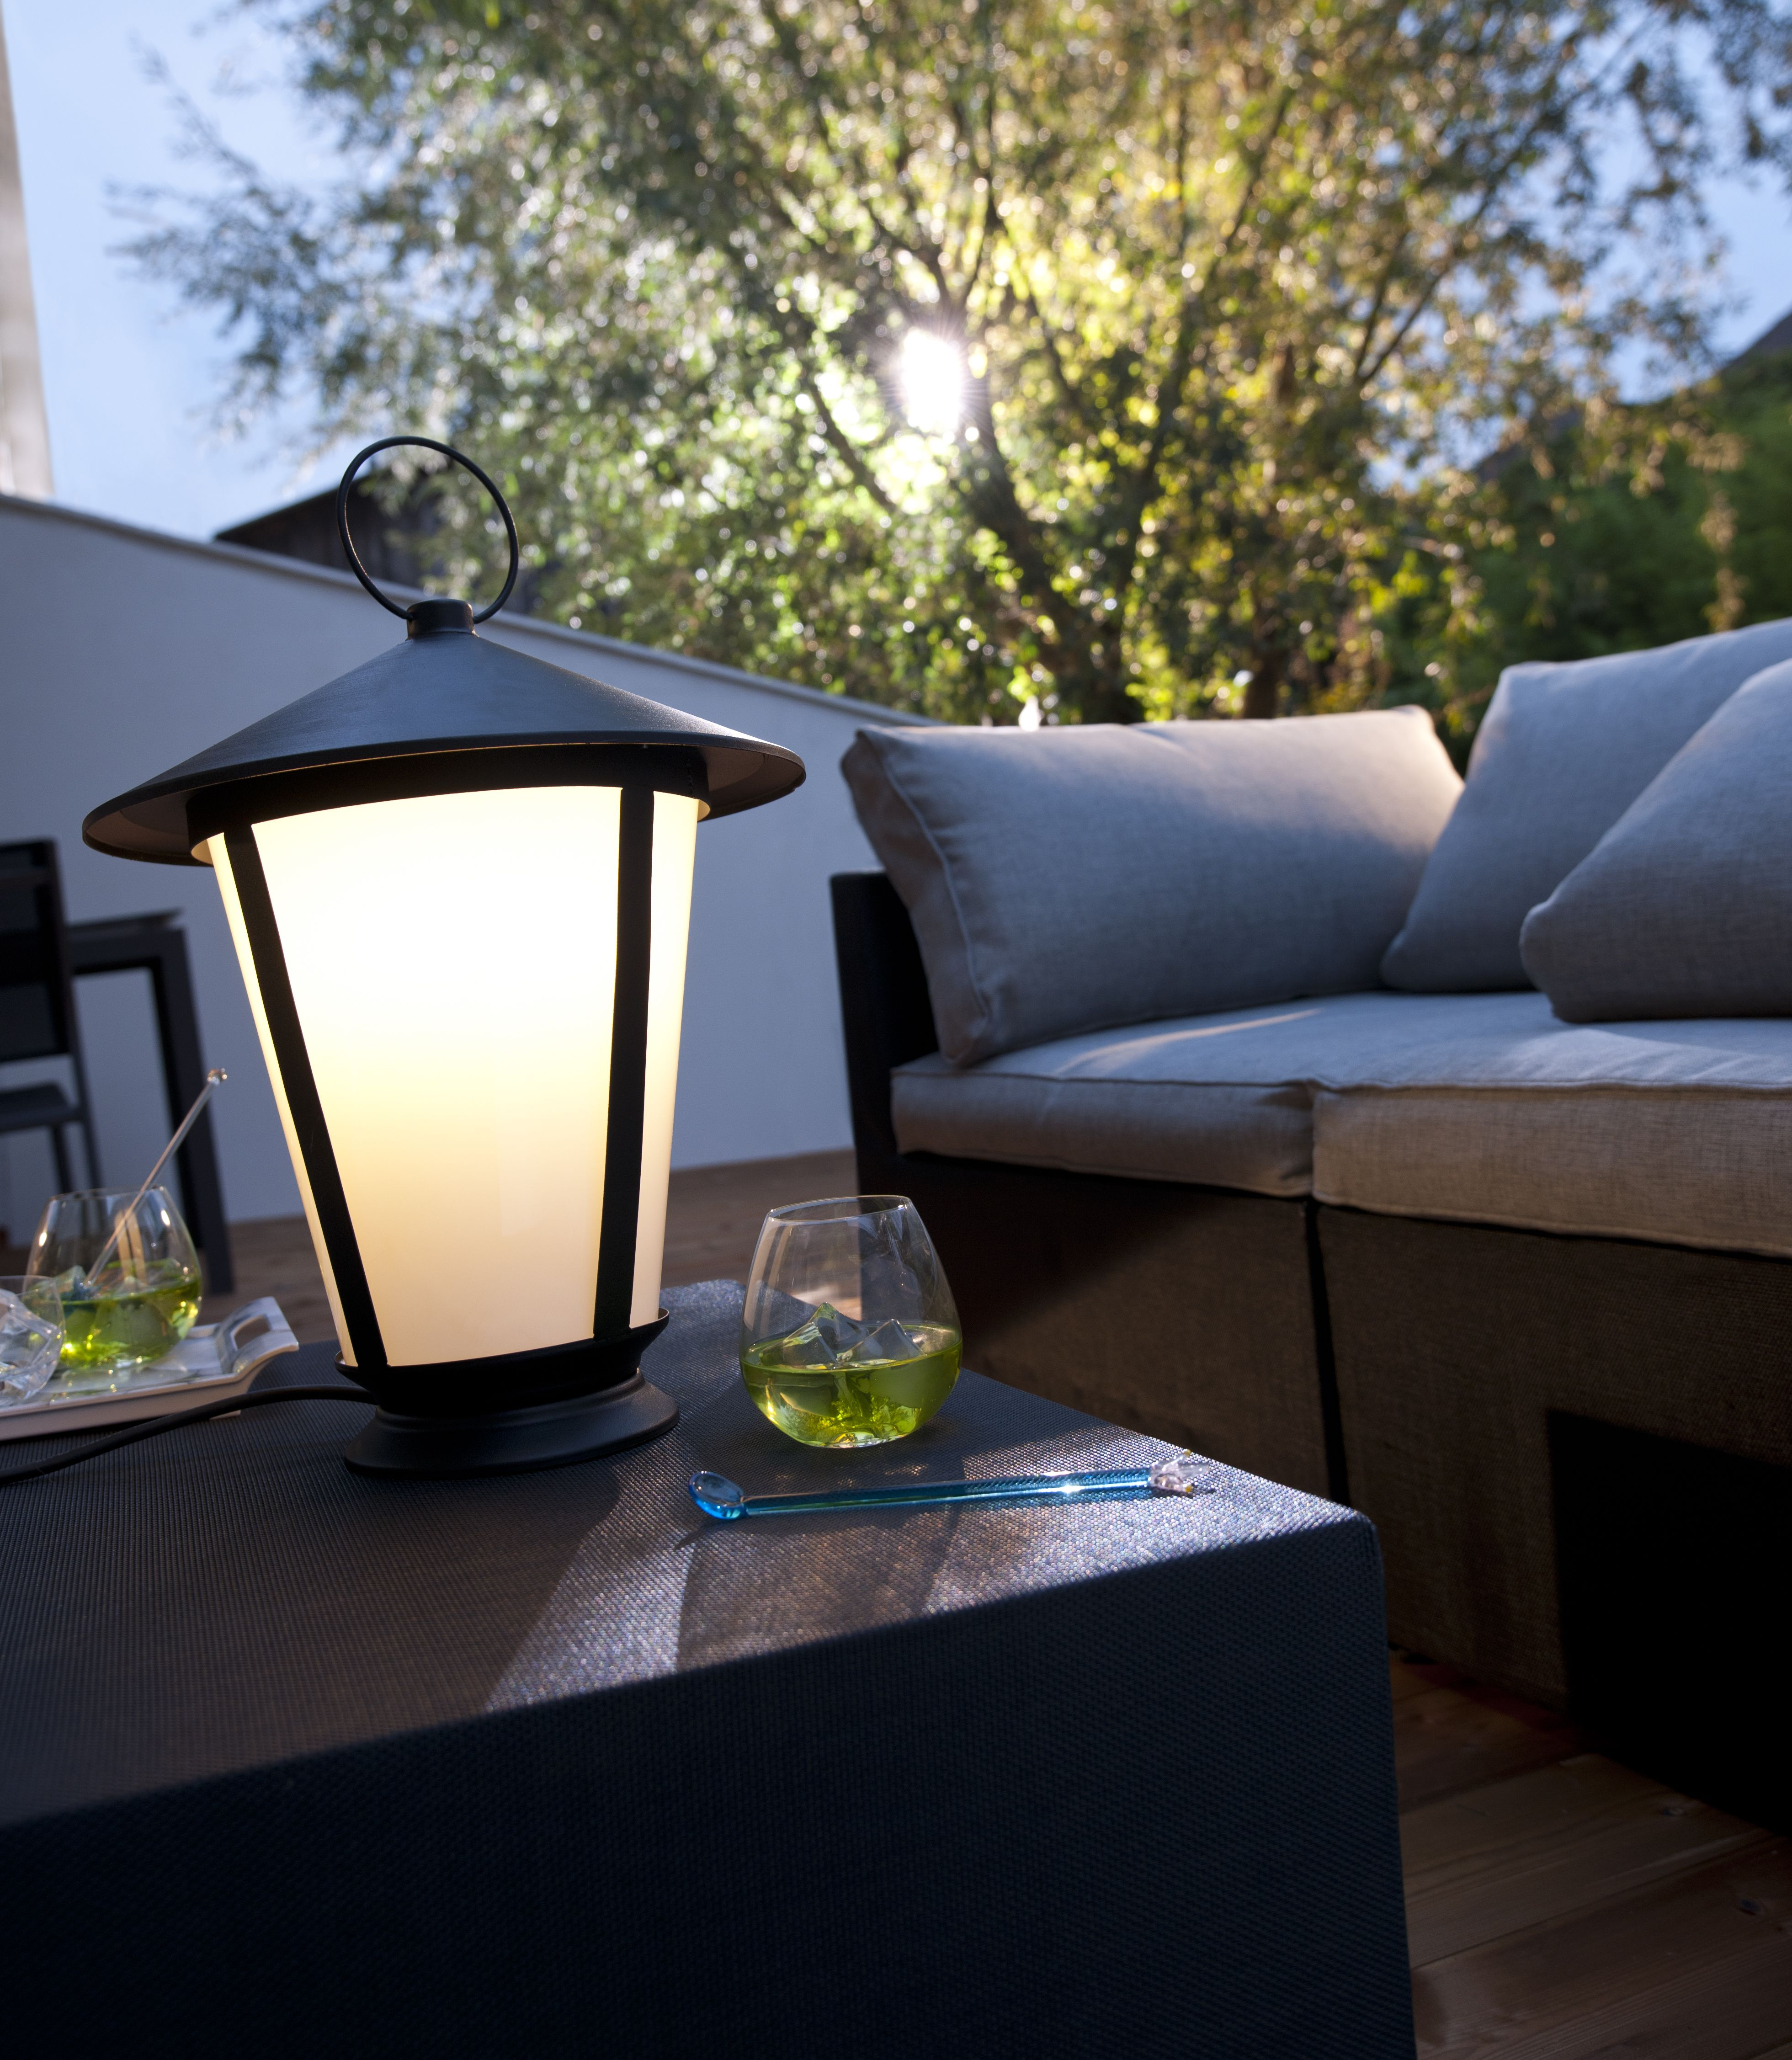 eclairage exterieur noel castorama. Black Bedroom Furniture Sets. Home Design Ideas